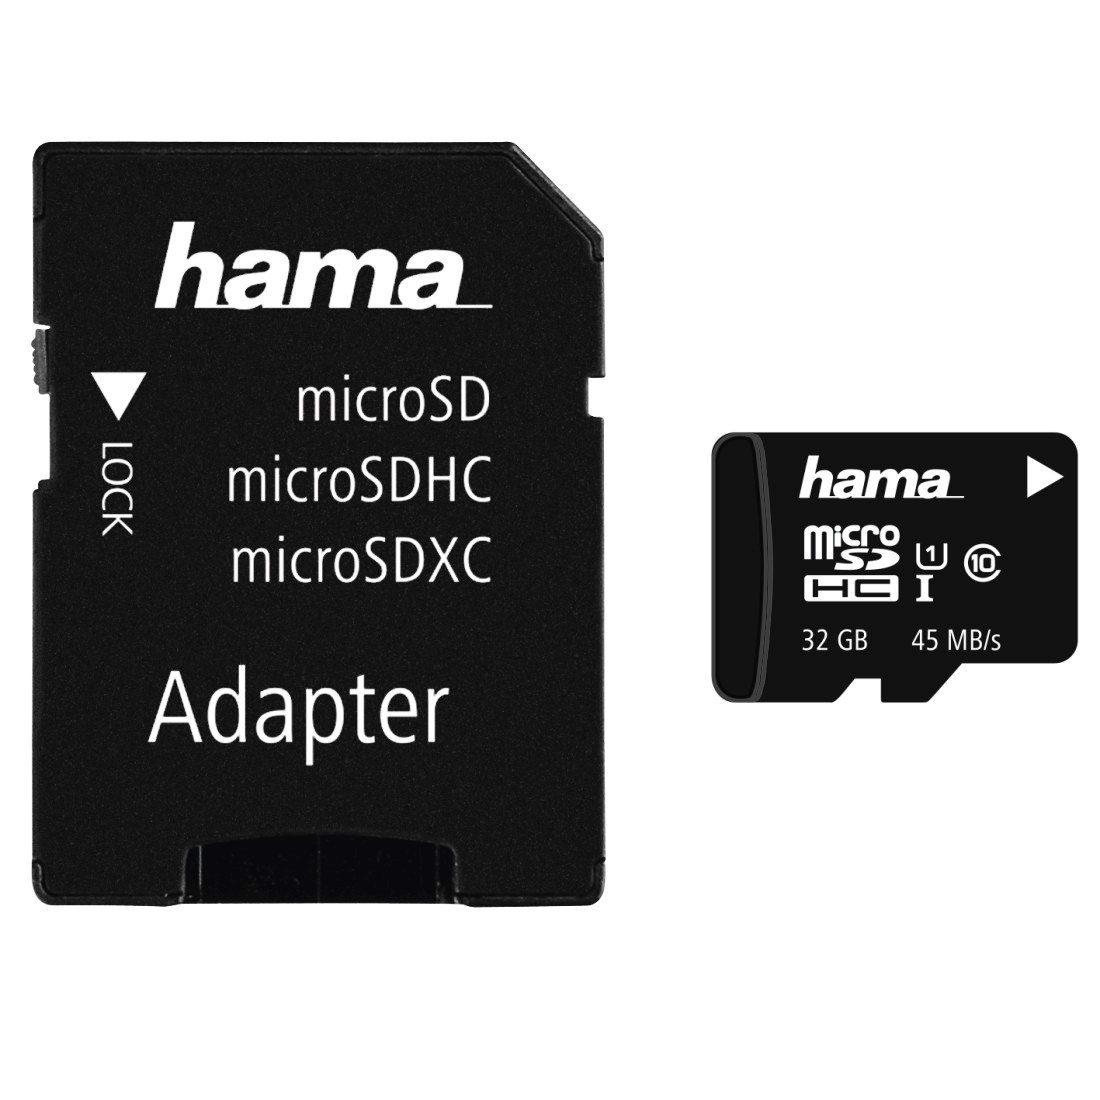 Hama Speicherkarte microSDHC 32GB Class 10 UHS-I »inkl. Adapter auf SD Karte«